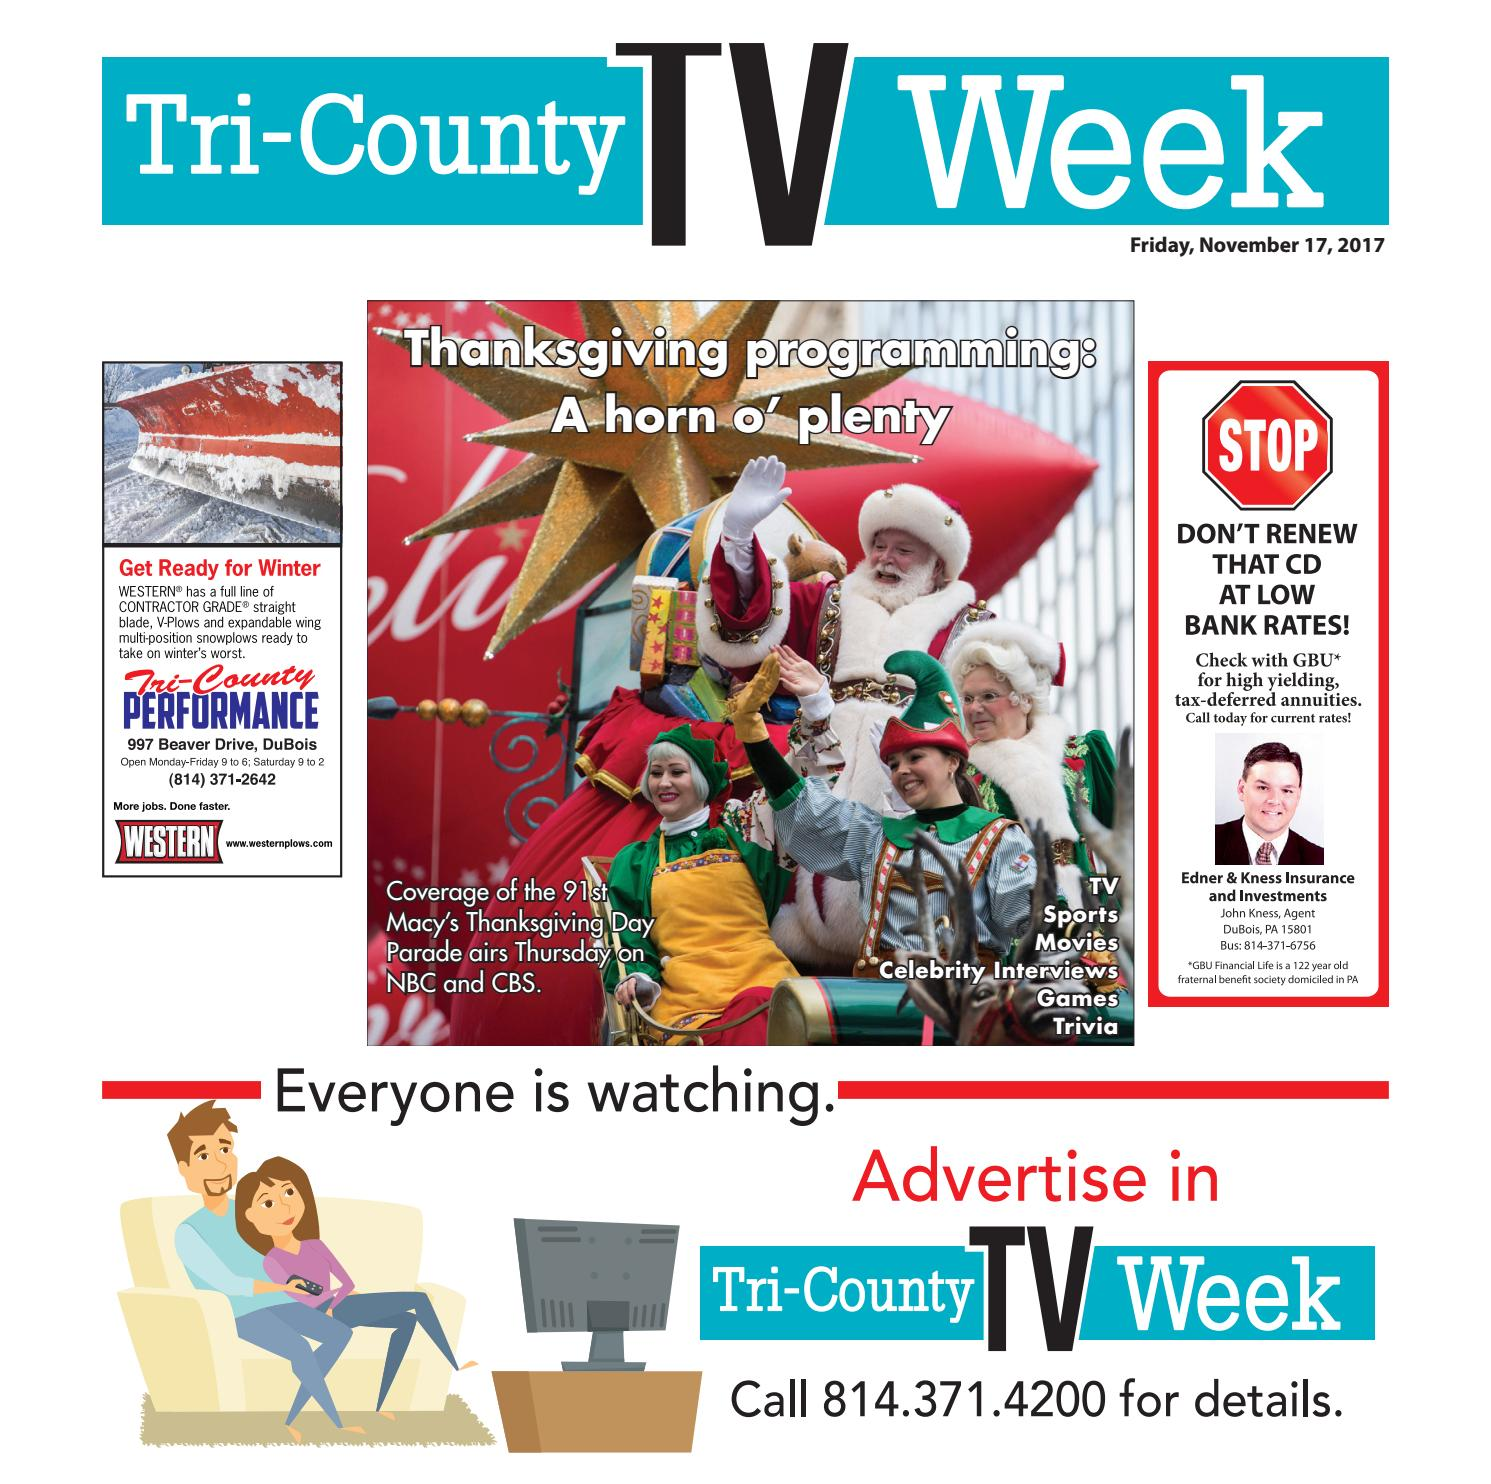 foto de TV Week 11/17/2017 by Tri-County TV Week - issuu